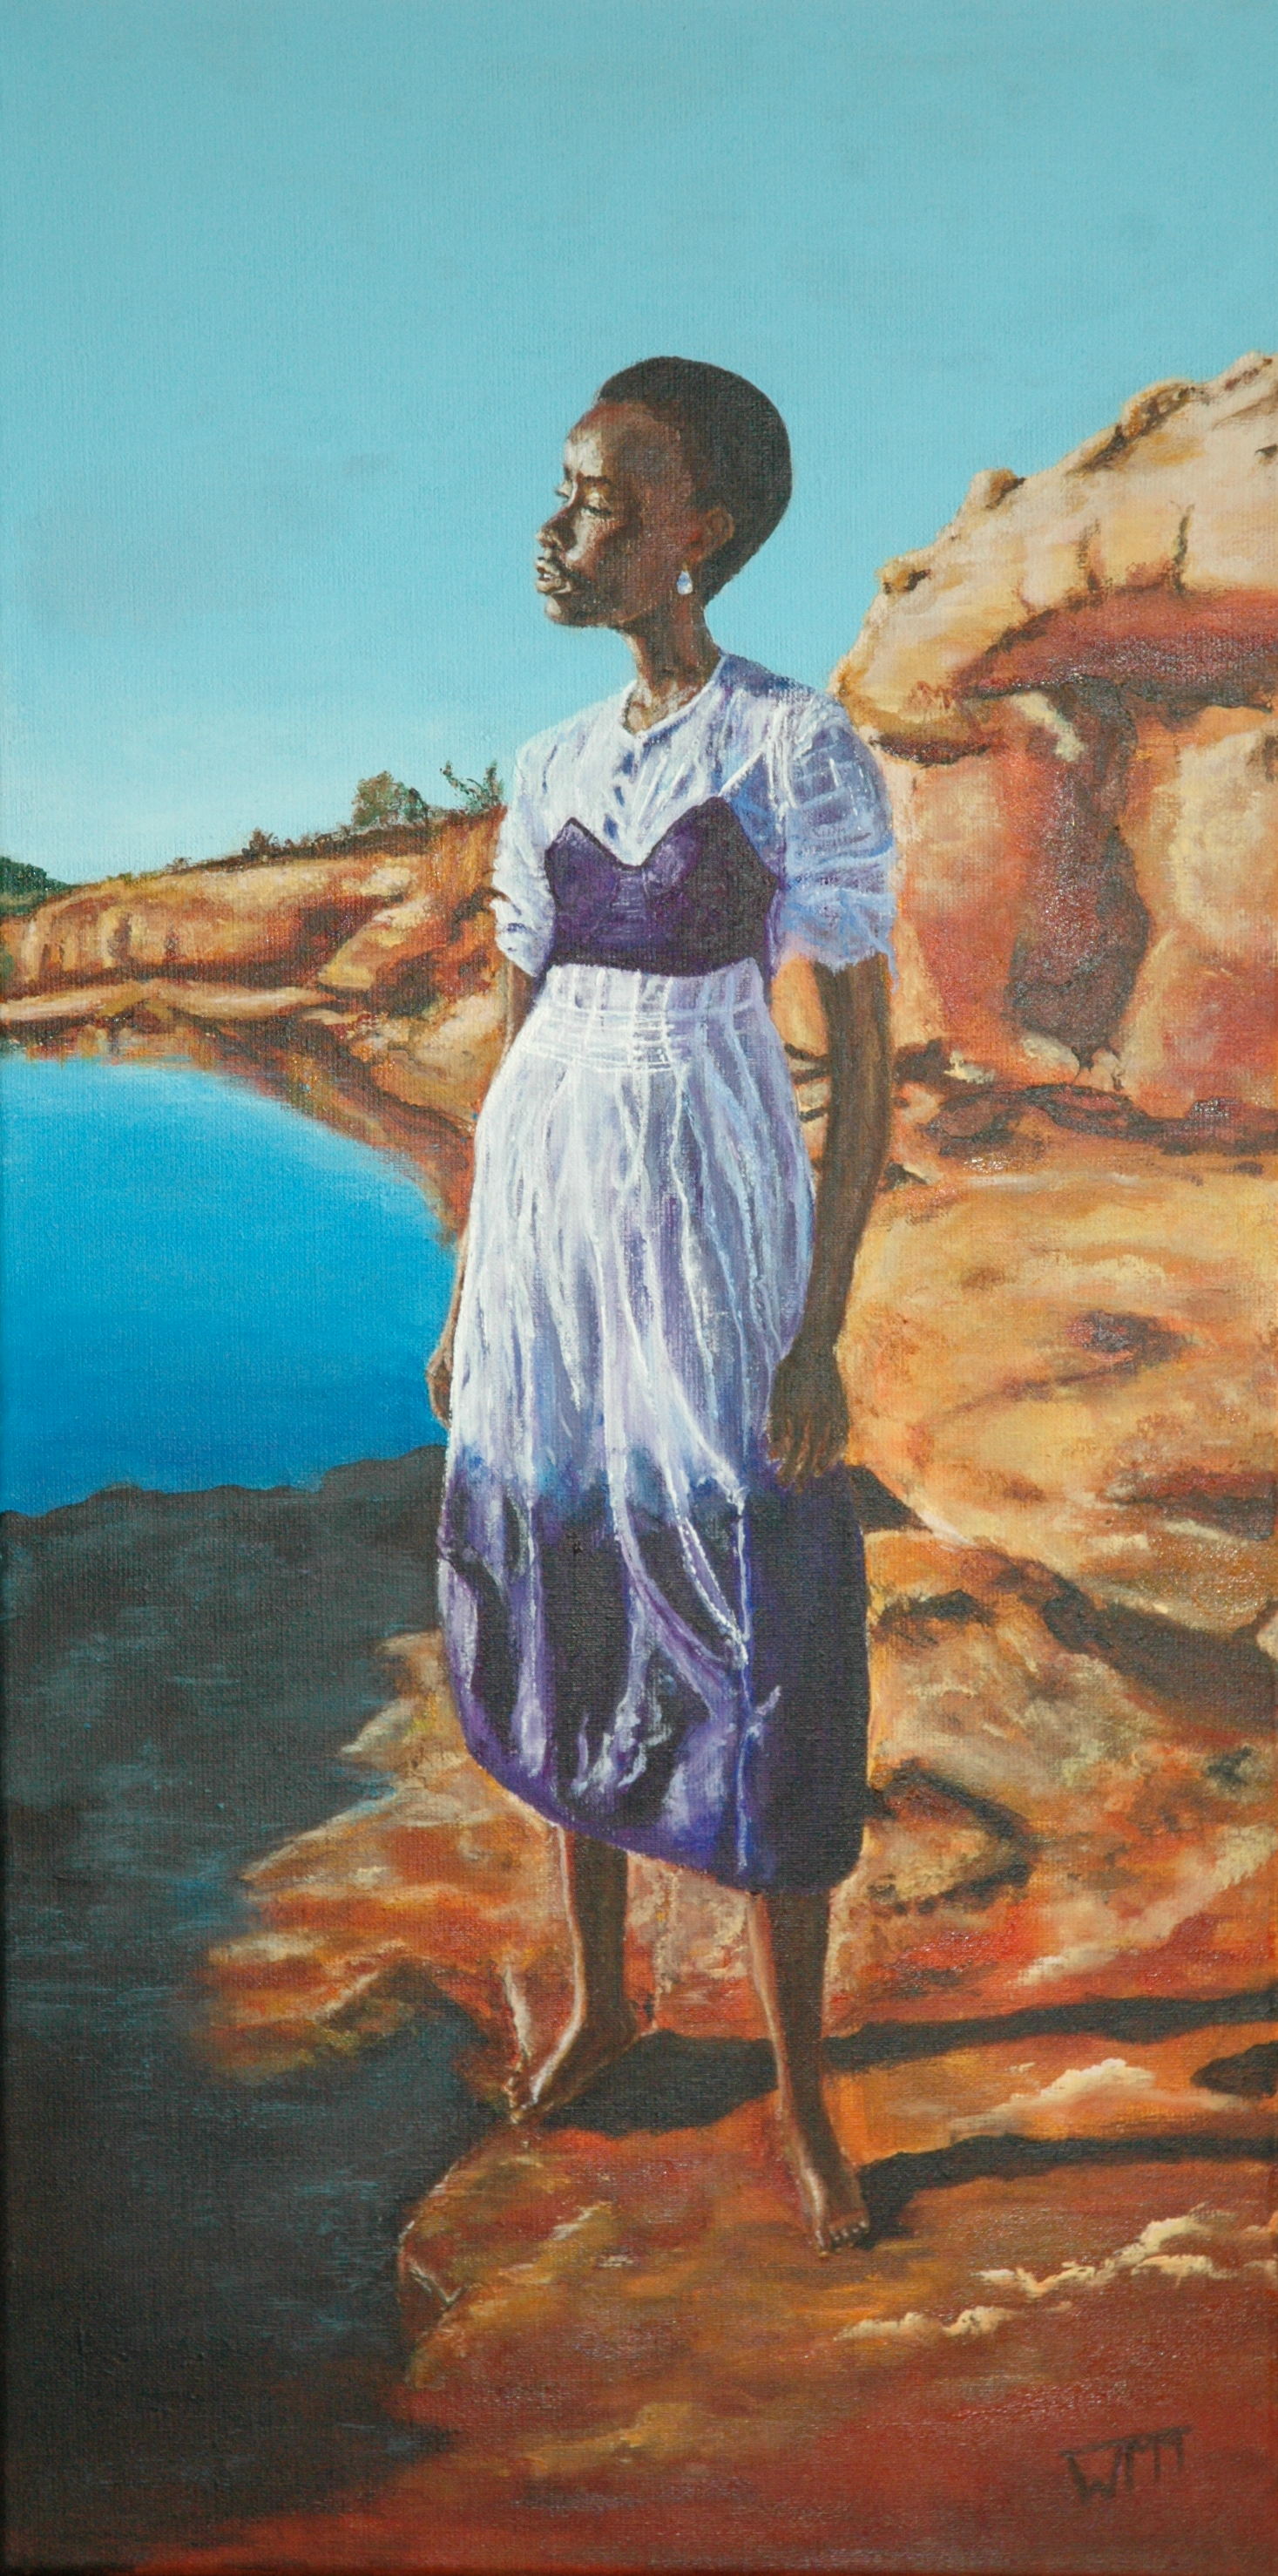 40 x 80cm, acryl op linnen, €265,- (studie)